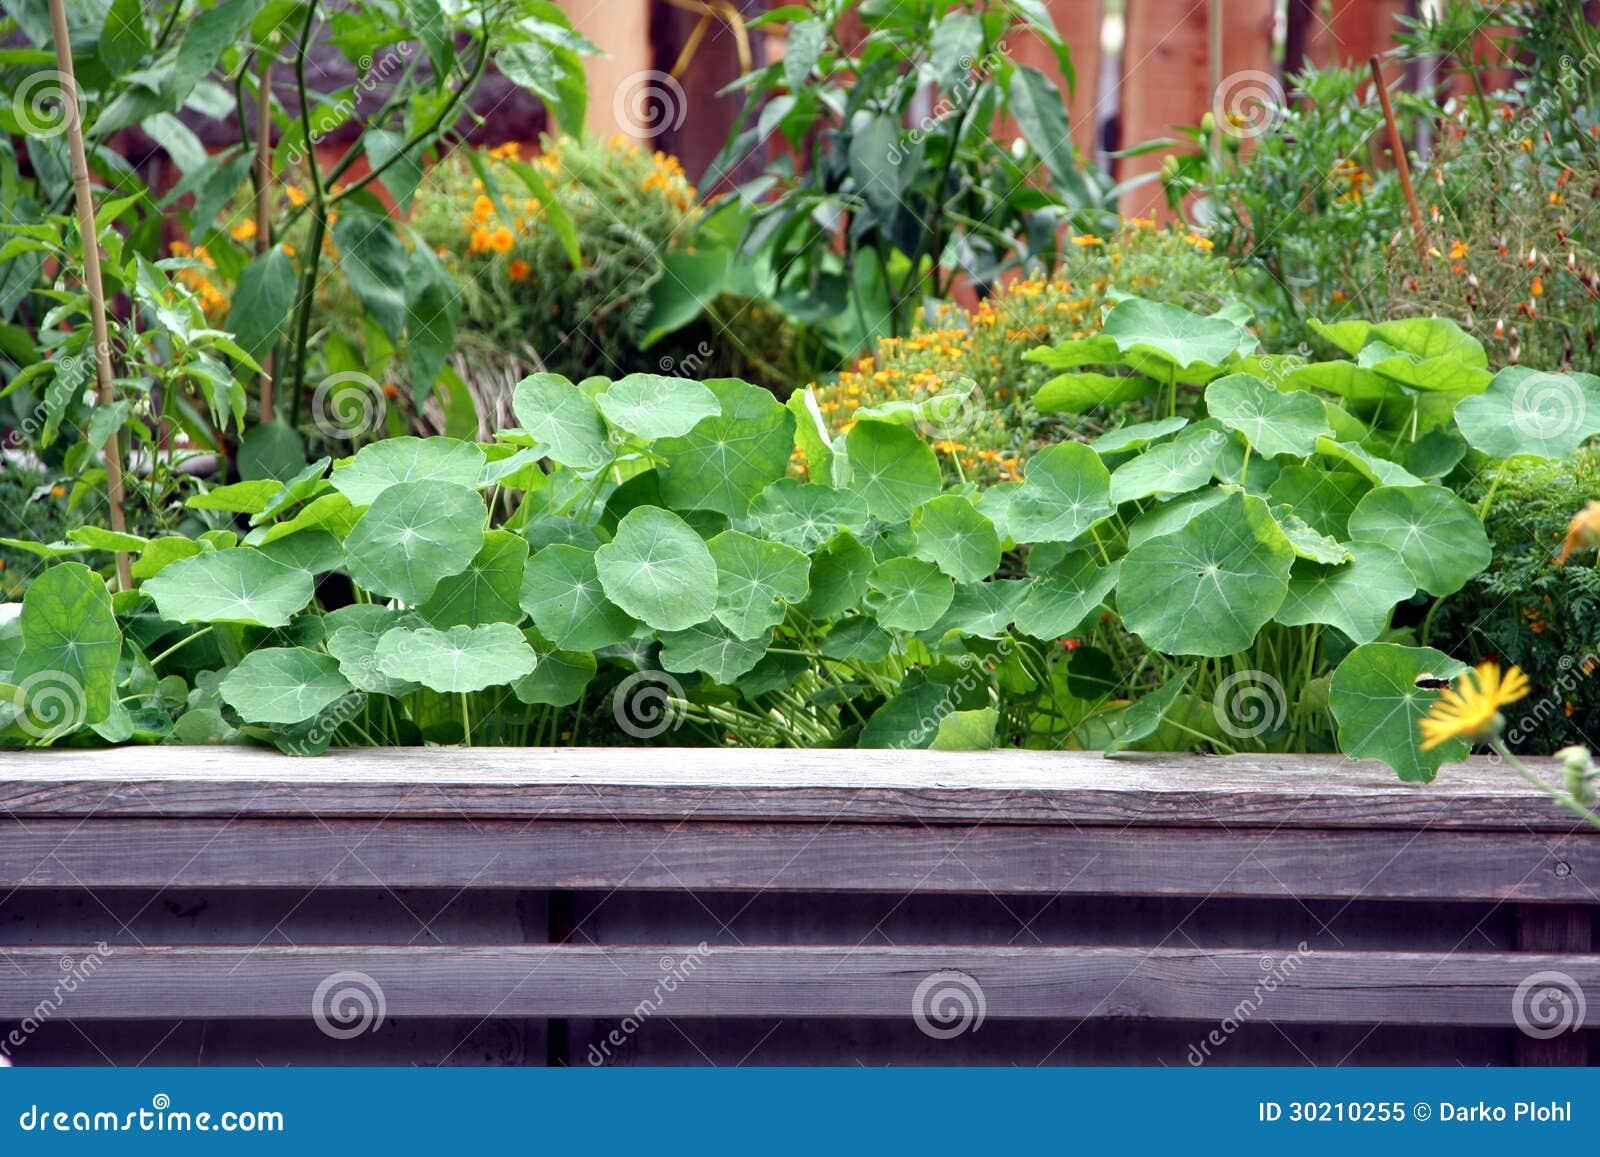 Raised Bed Vegetable Flower Garden Royalty Free Stock Image 85932730